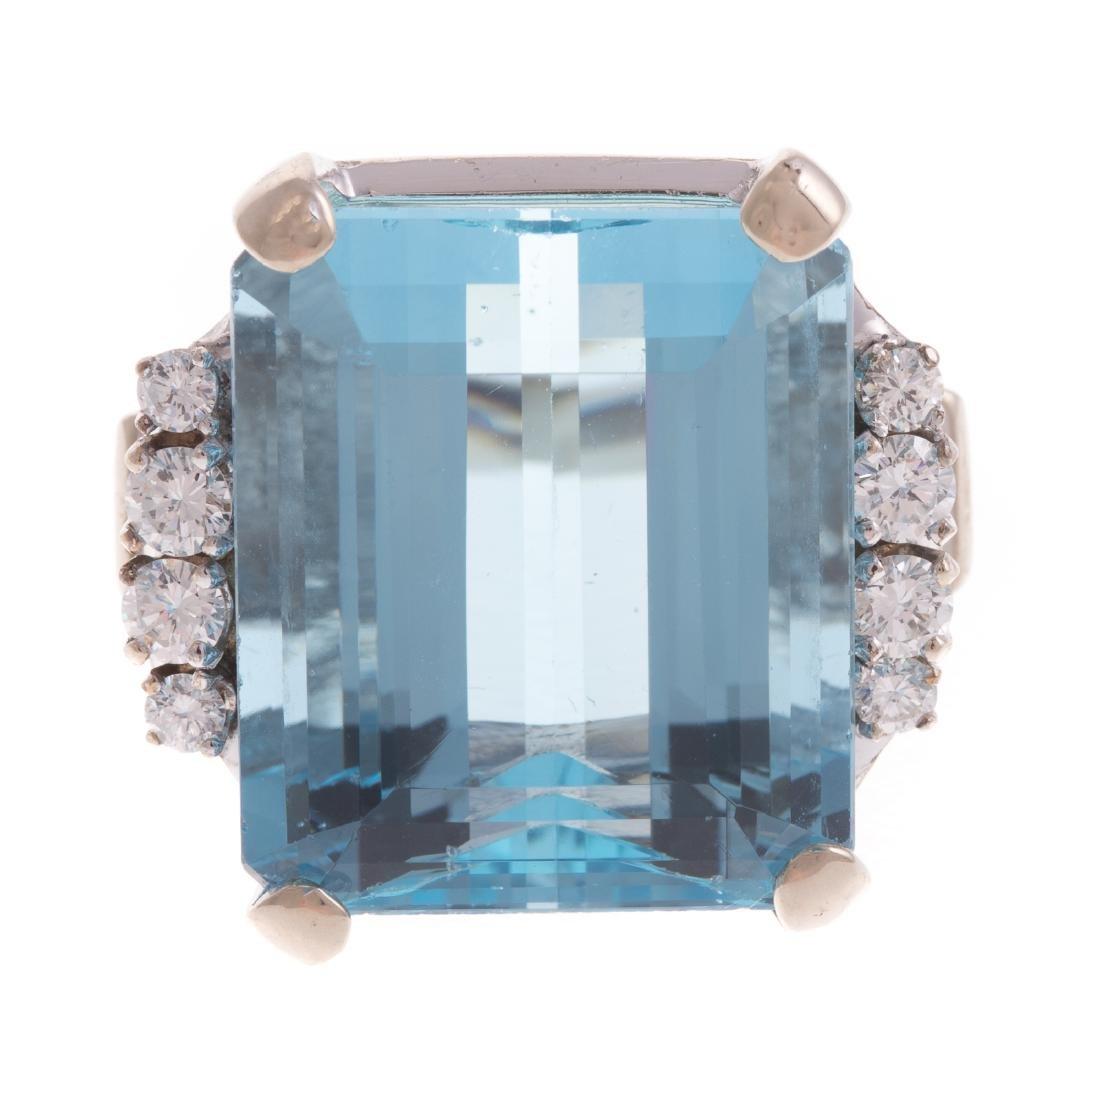 A Statement Aquamarine & Diamond Ring in Gold